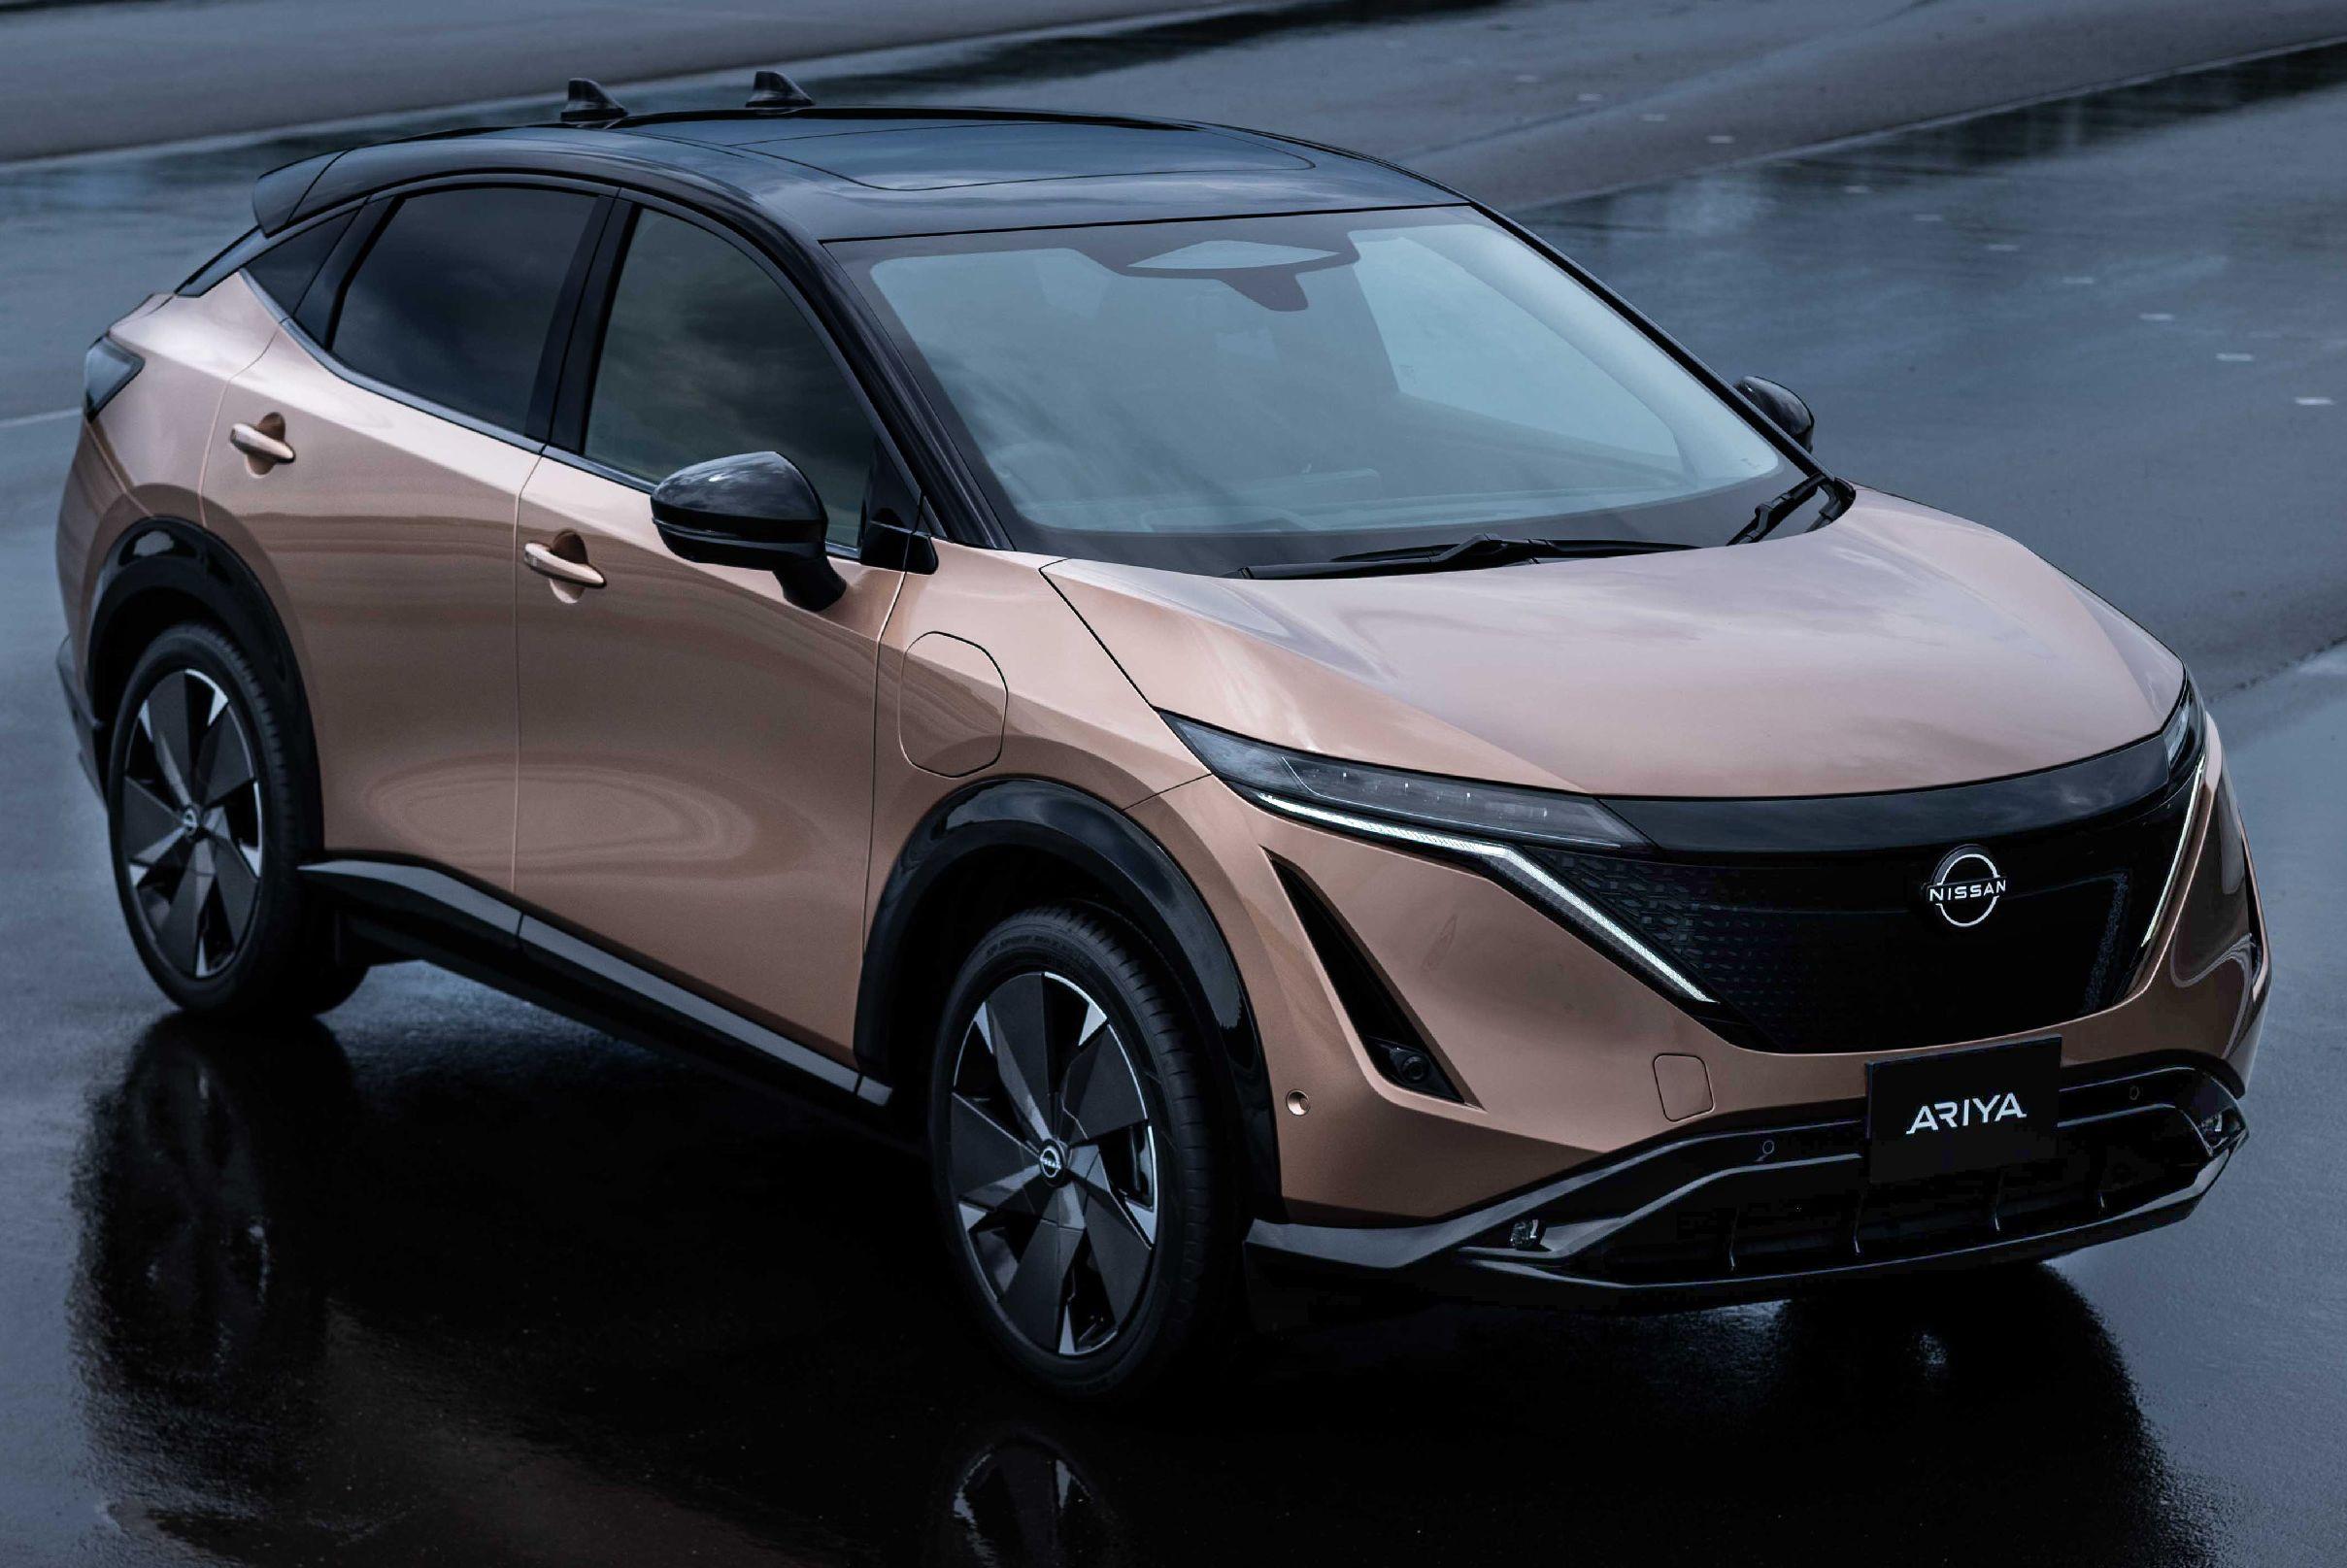 Nissan Ariya Production Electric Suv Up To 388 Hp 610 Km Range E 4orce Awd 0 100 Km H 5 1 Secs Paultan Org